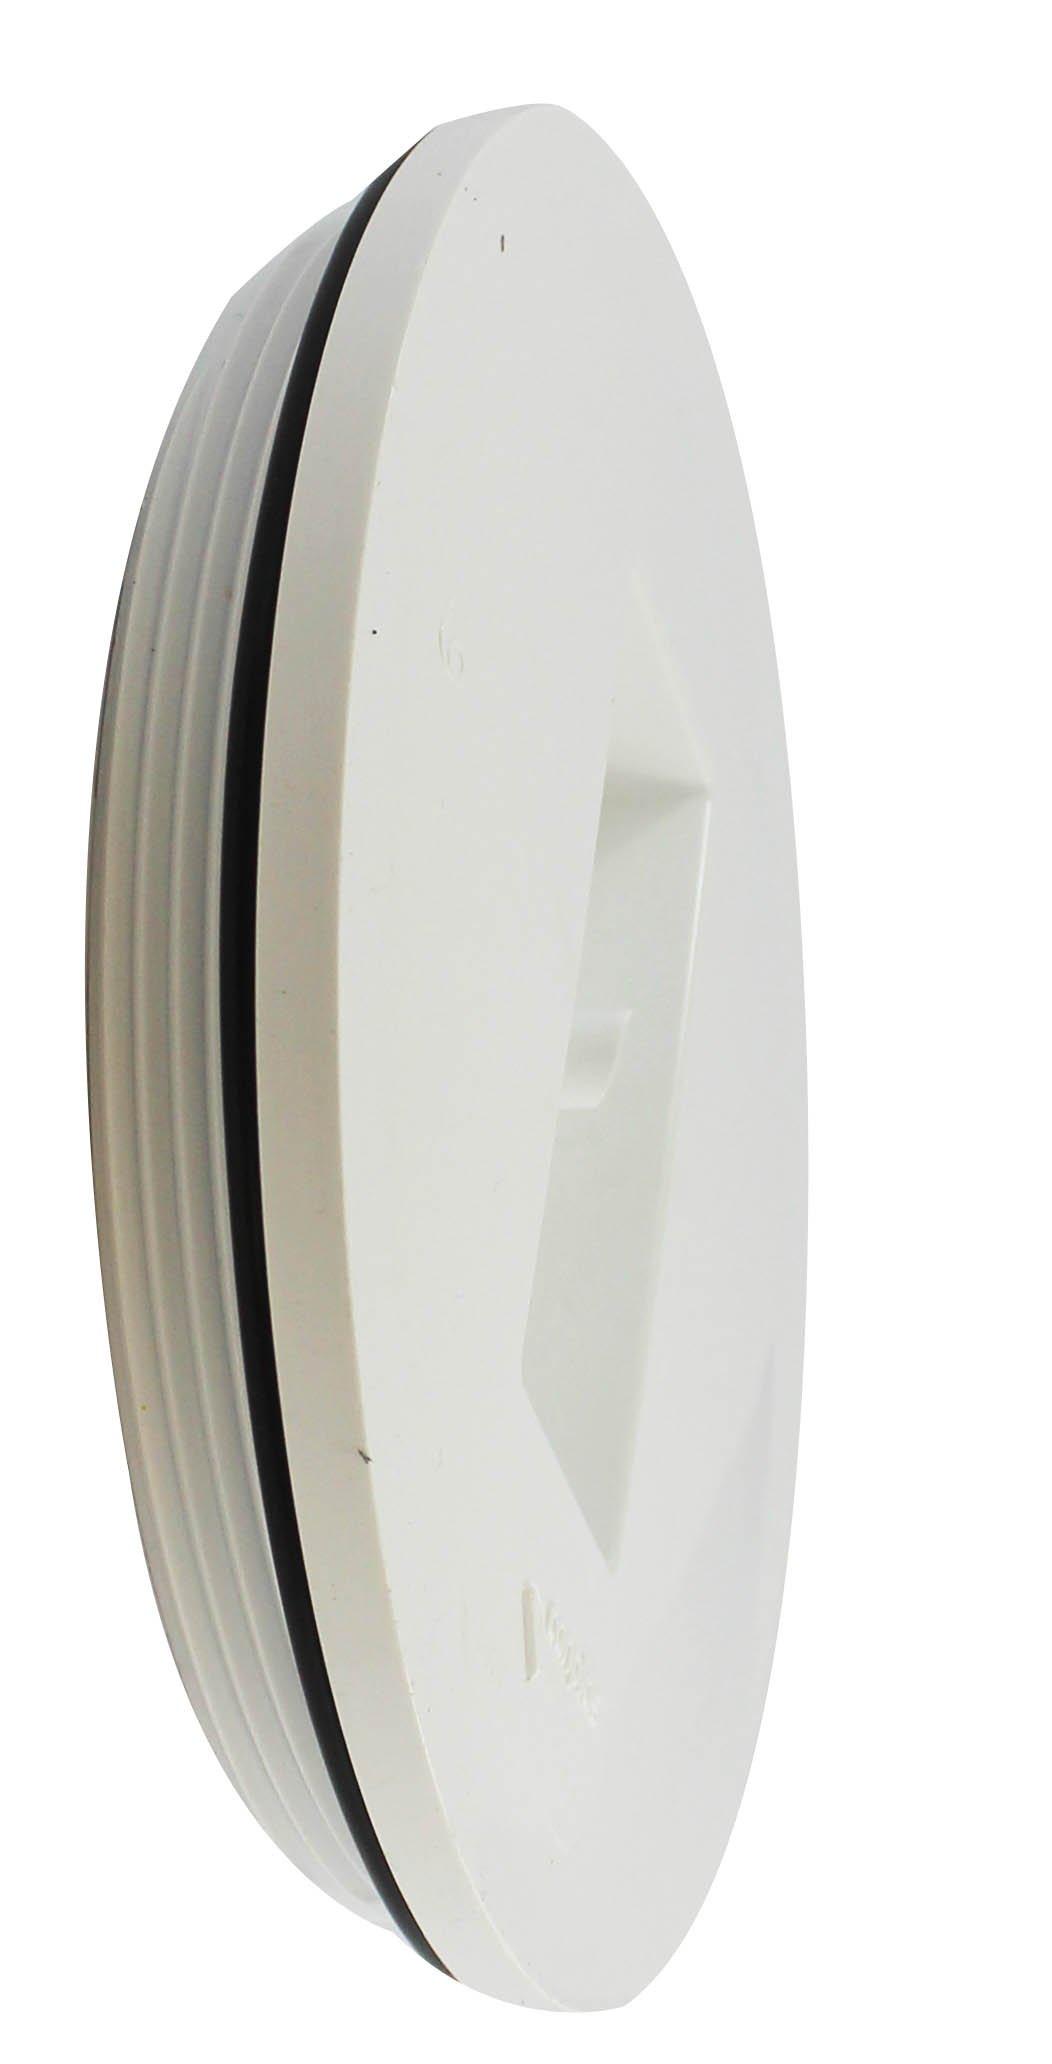 Canplas 193066 PVC DWV Countersink Plug, 6-Inch, White